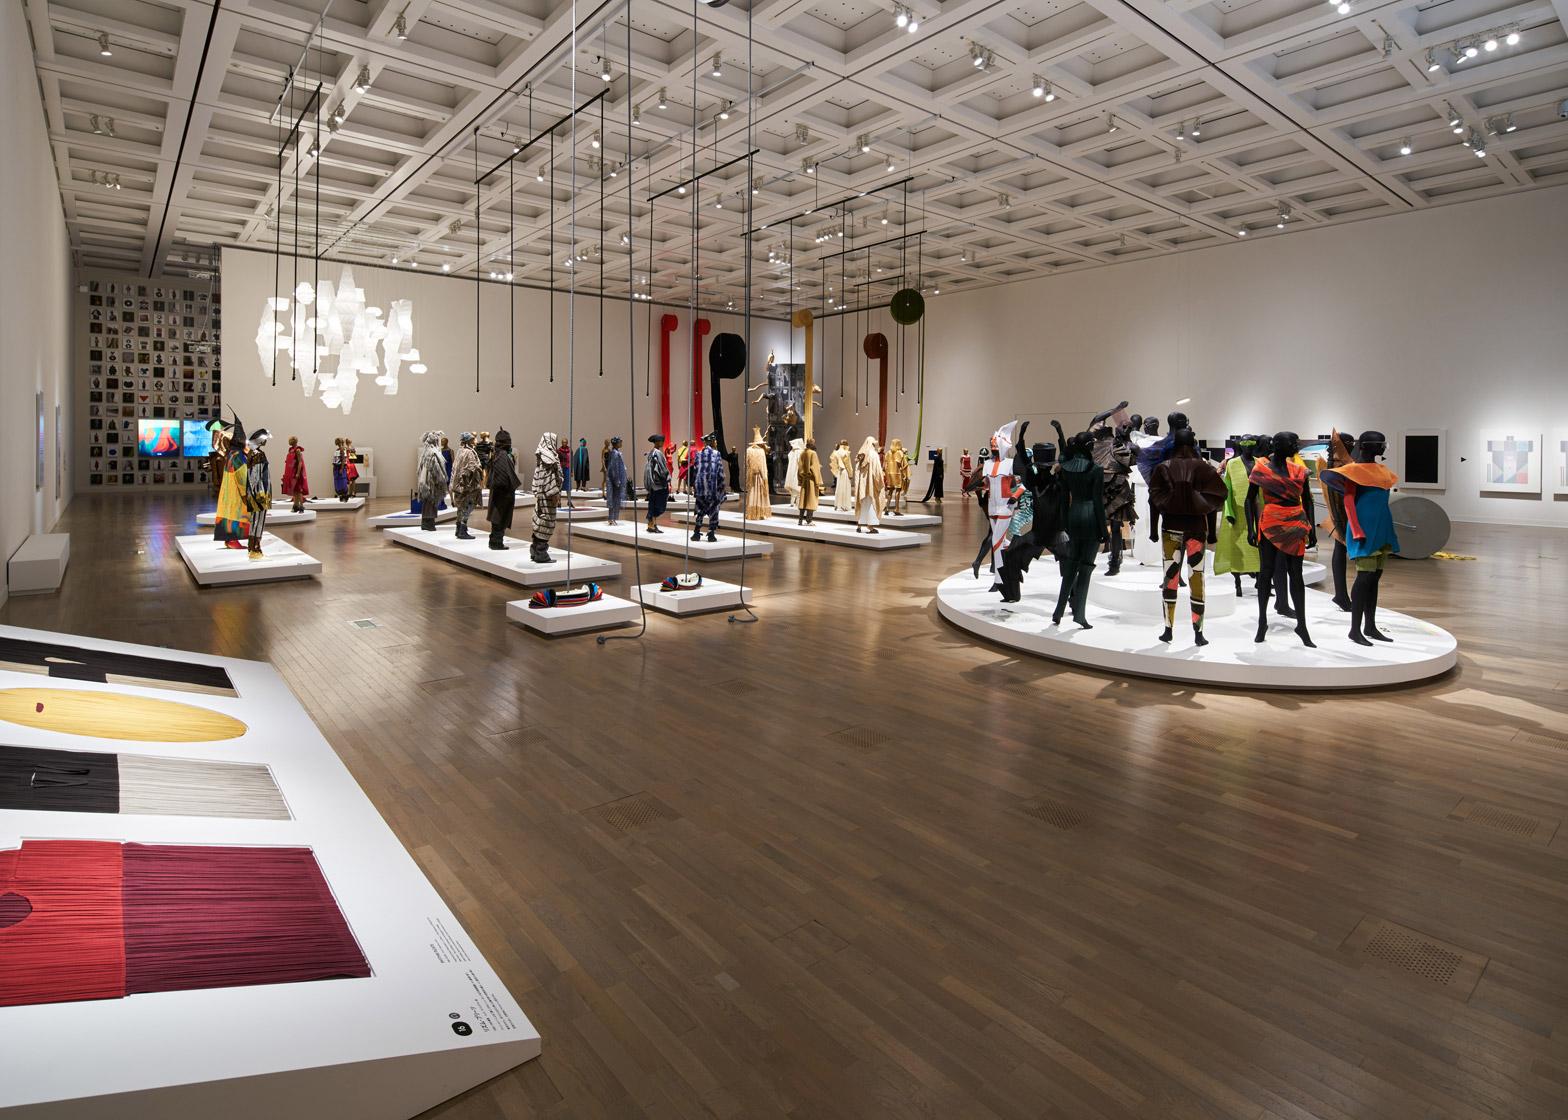 the-work-of-miyake-issey-exhibition-the-national-art-centre-tokyo_dezeen_1568_5.jpg